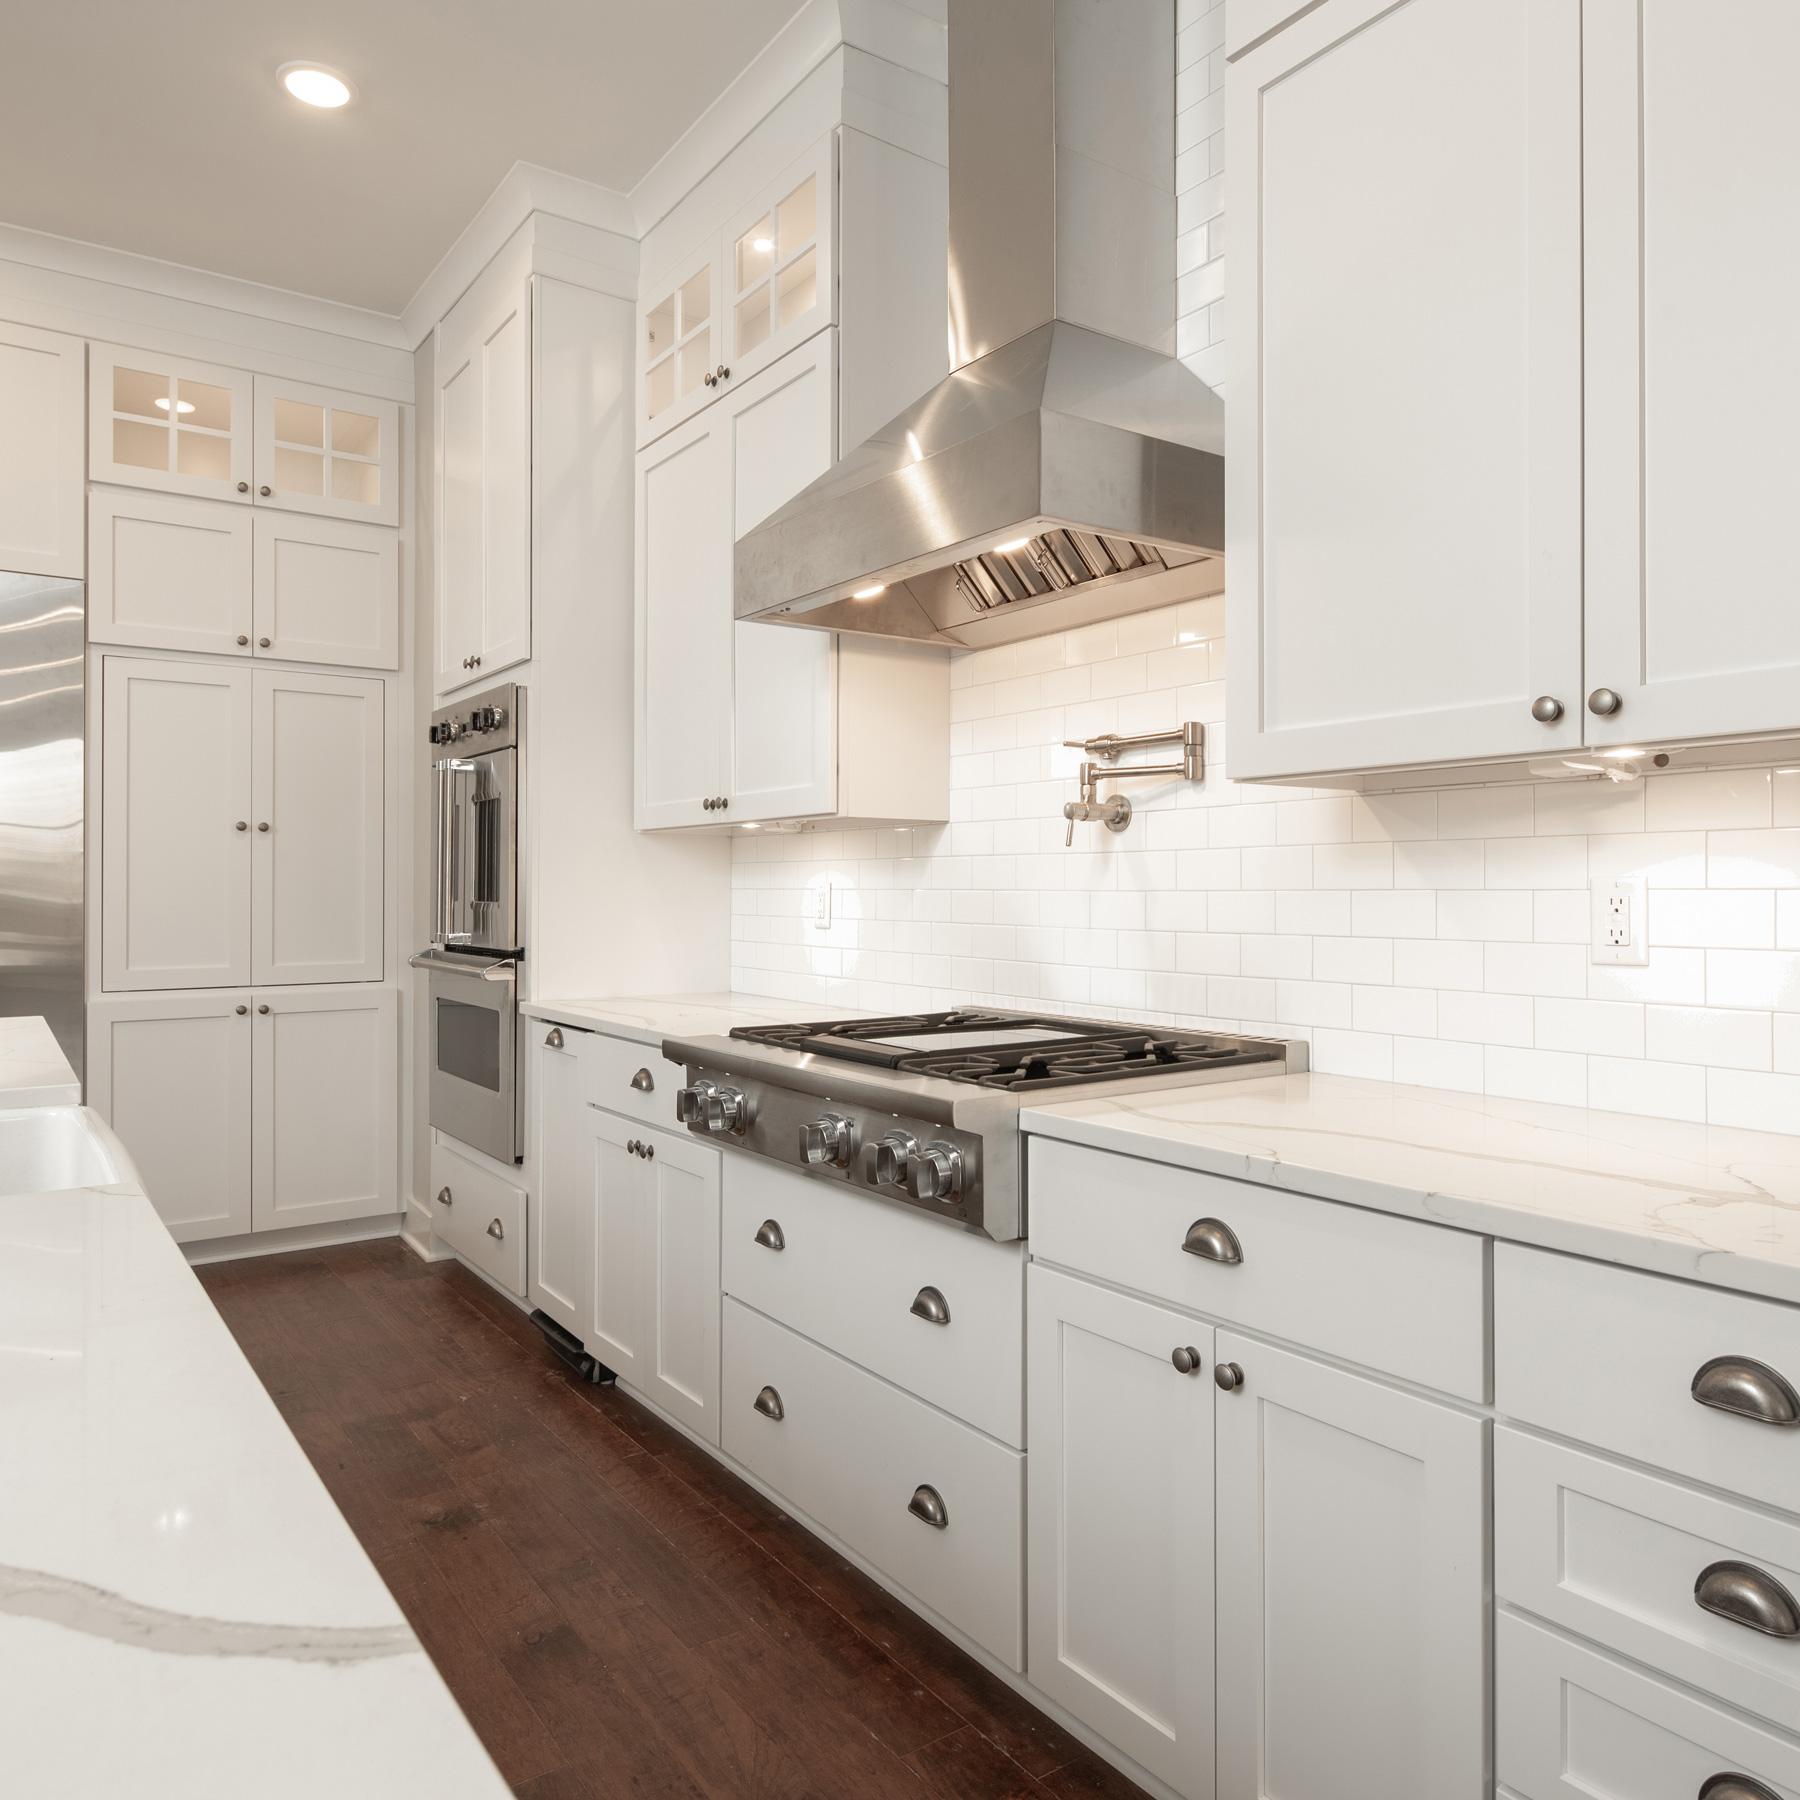 Home Kitchen Bath Design Inc